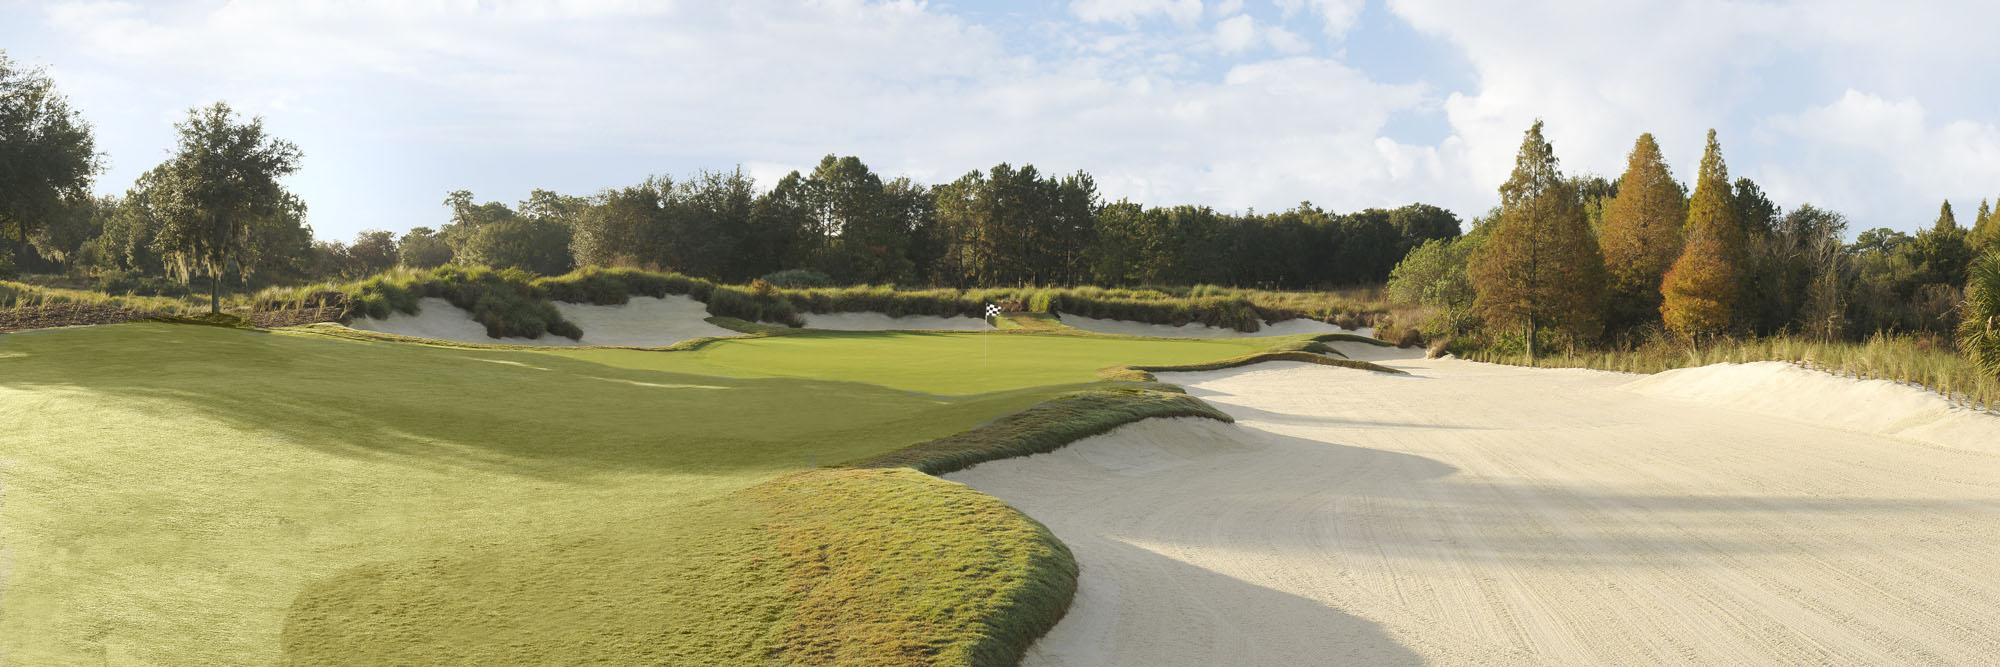 Golf Course Image - Old Memorial Golf Club No. 4